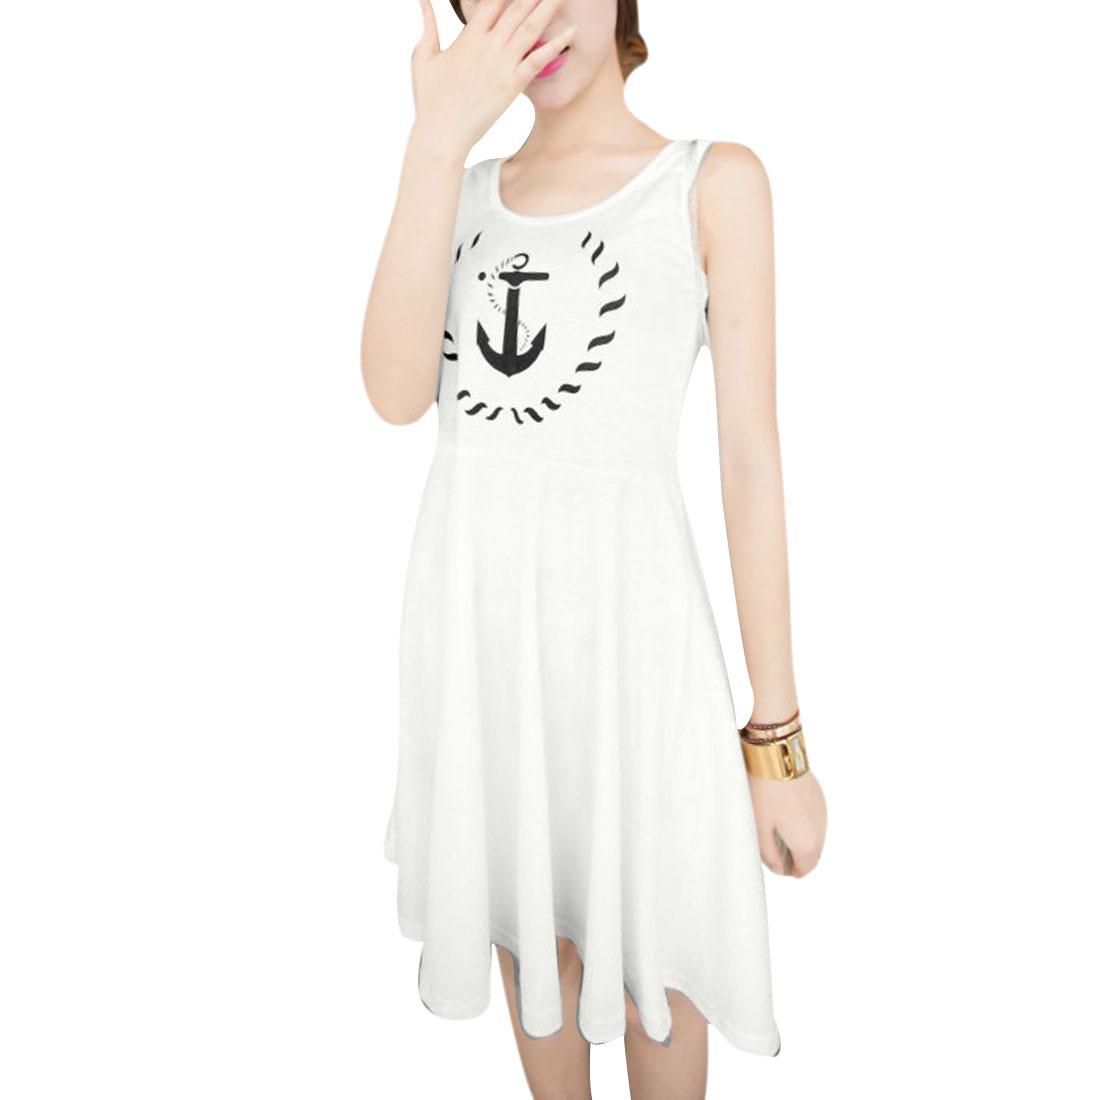 Women Above Knee Anchor Mark Prints Fashional Dress White XS